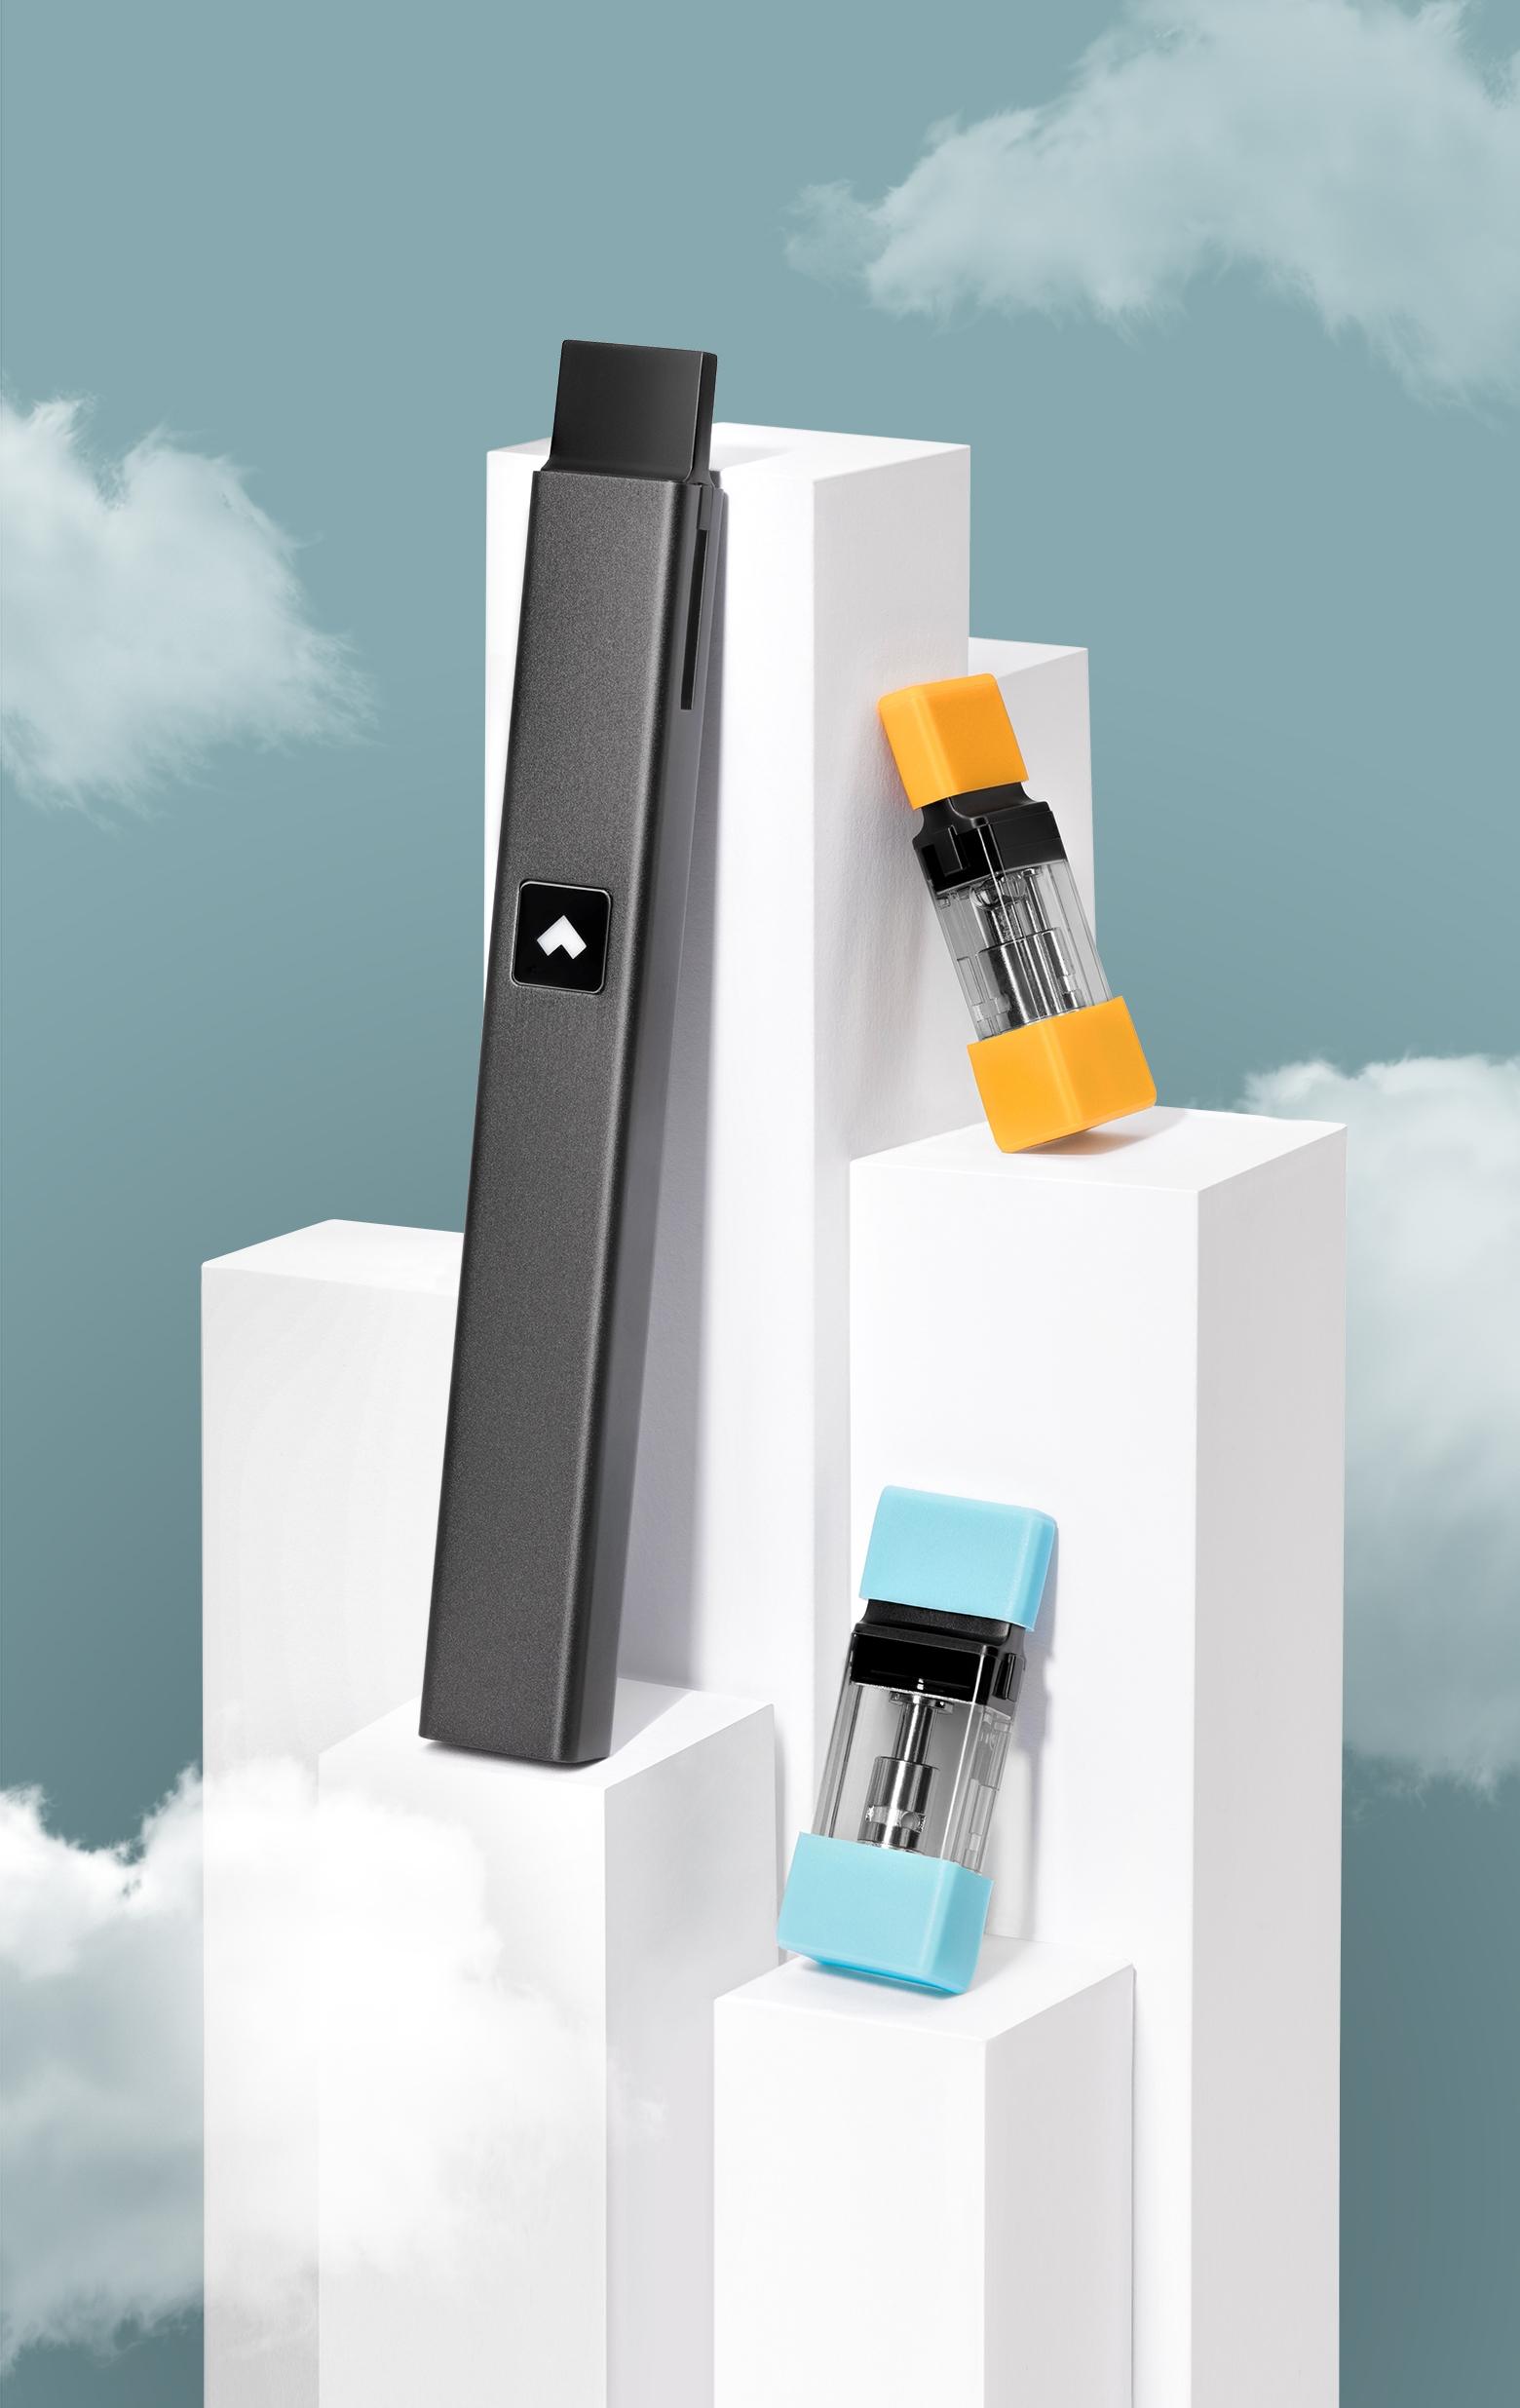 hero-image-baton-vapor-product-everett